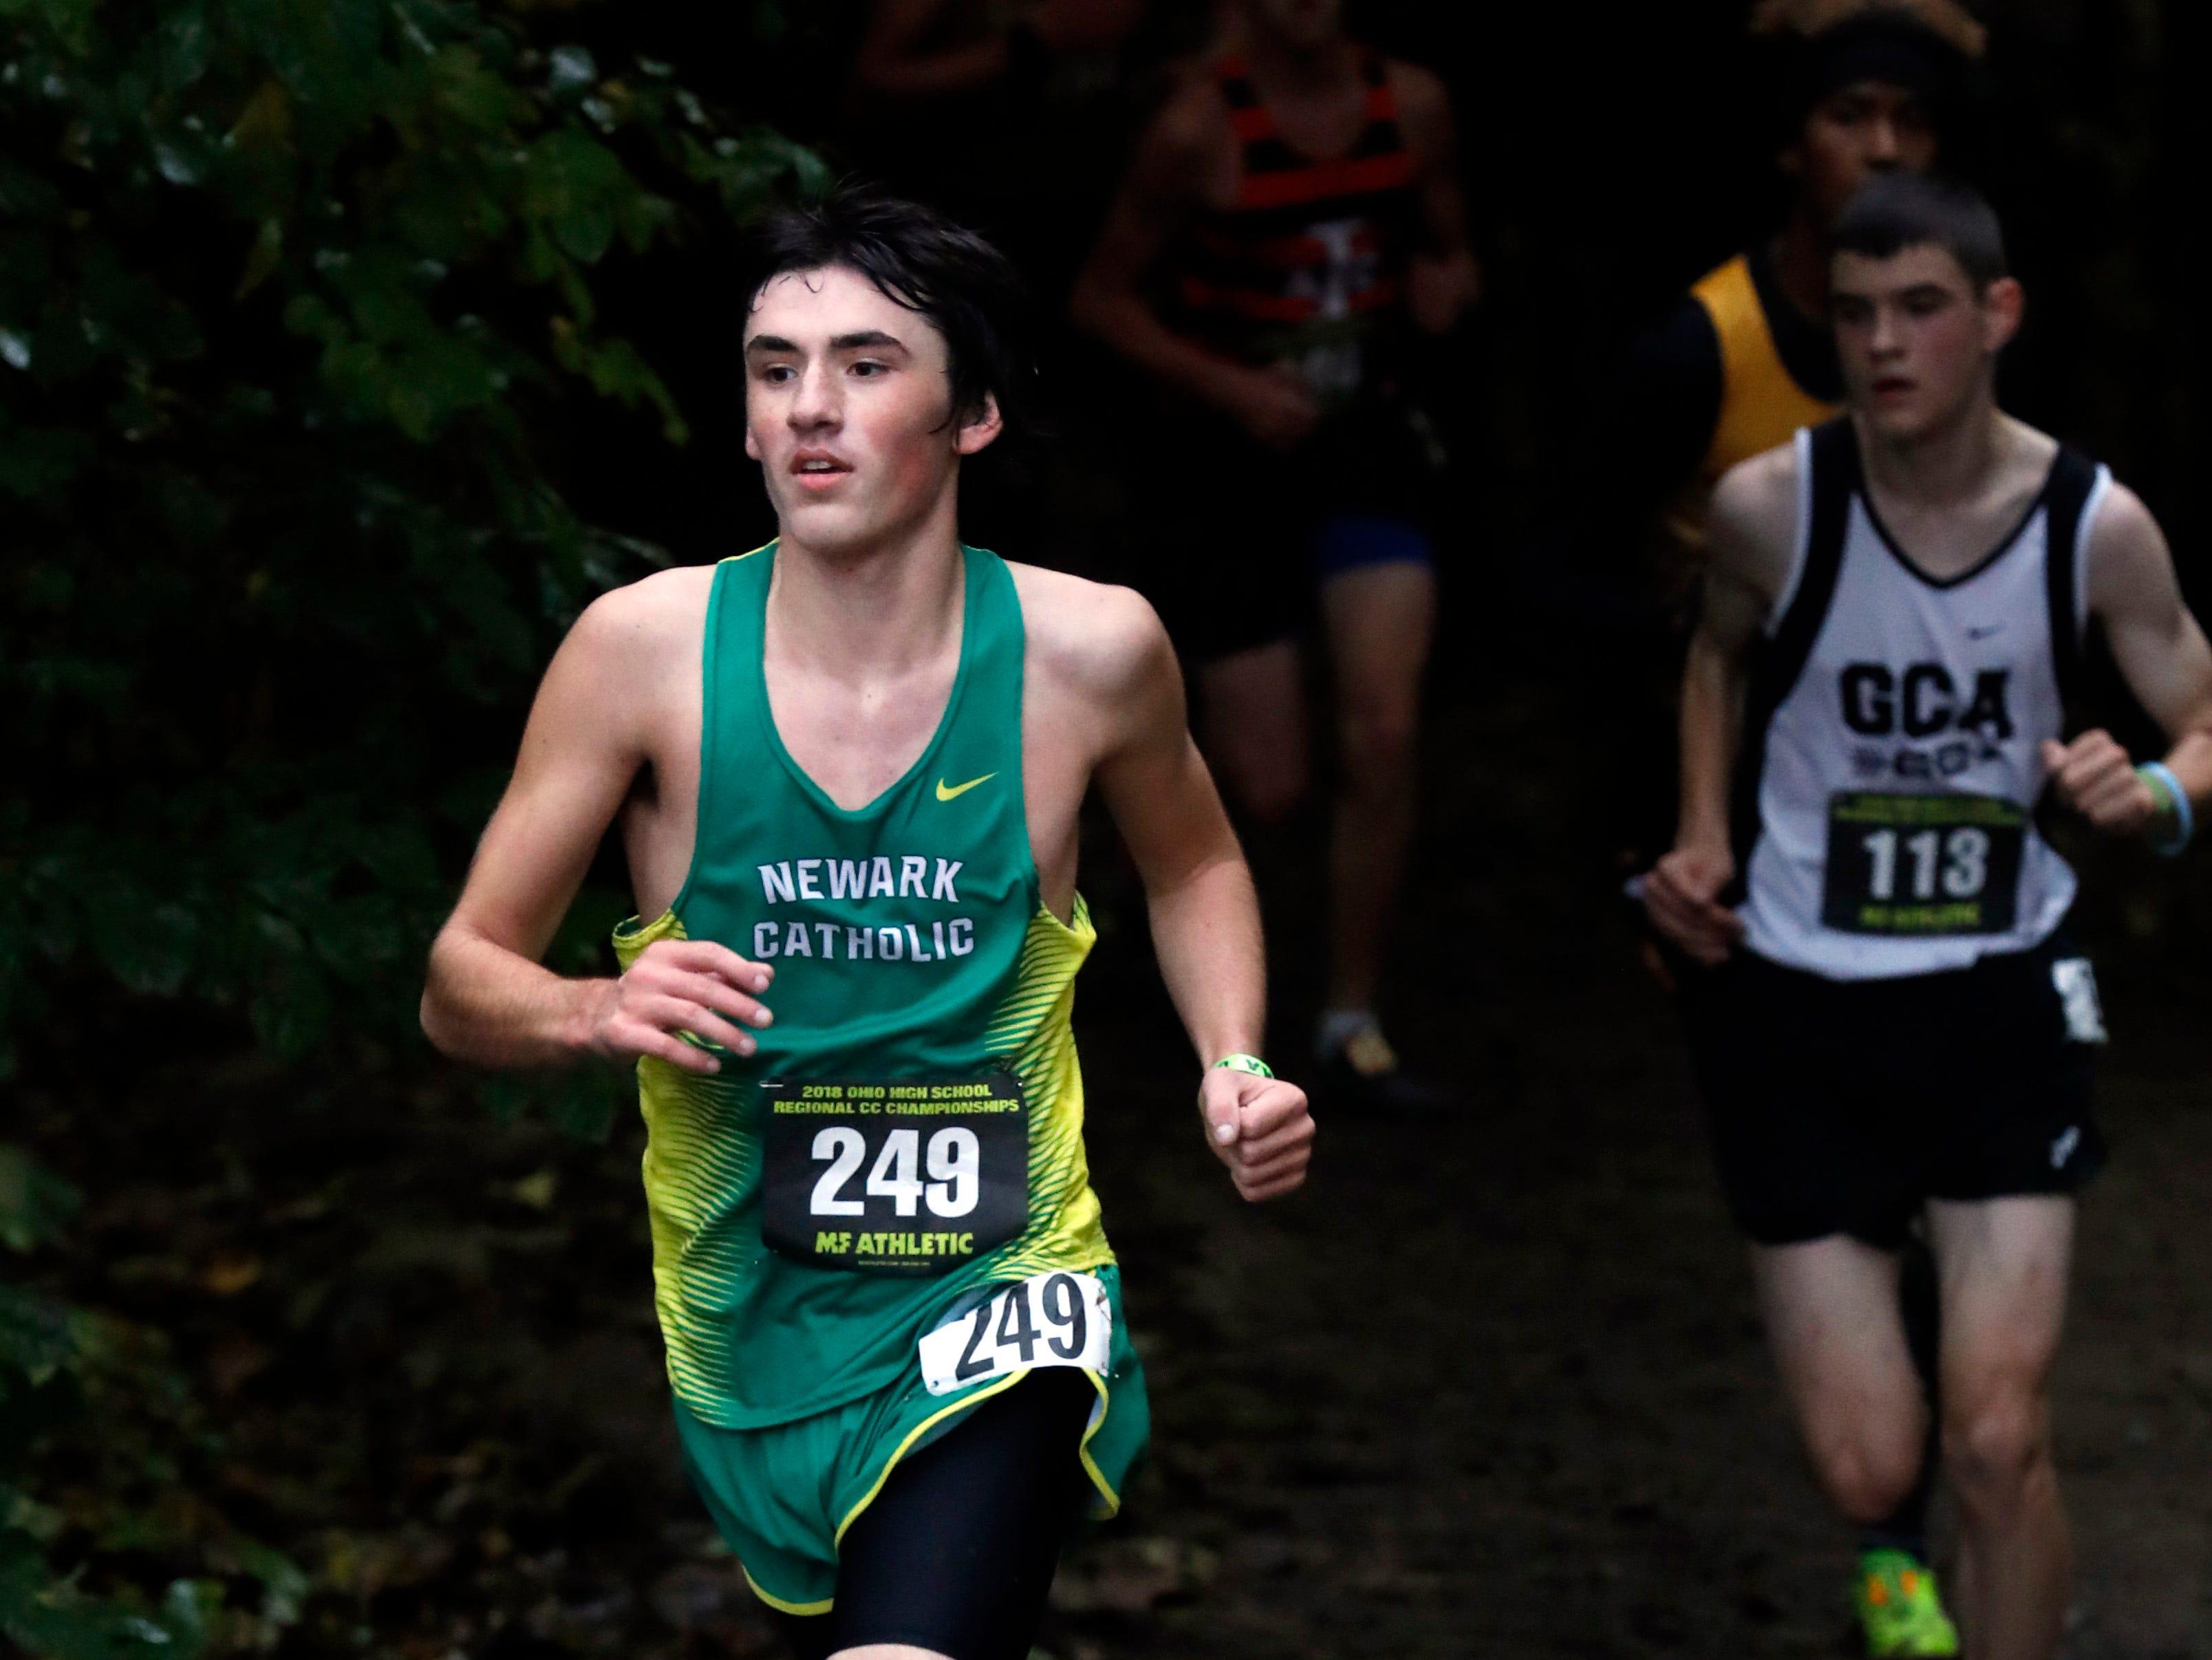 Newark Catholic's Pierce Ormond runs in the Regional Cross Country meet Saturday, Oct. 27, 2018, at Pickerington North High School in Pickerington.